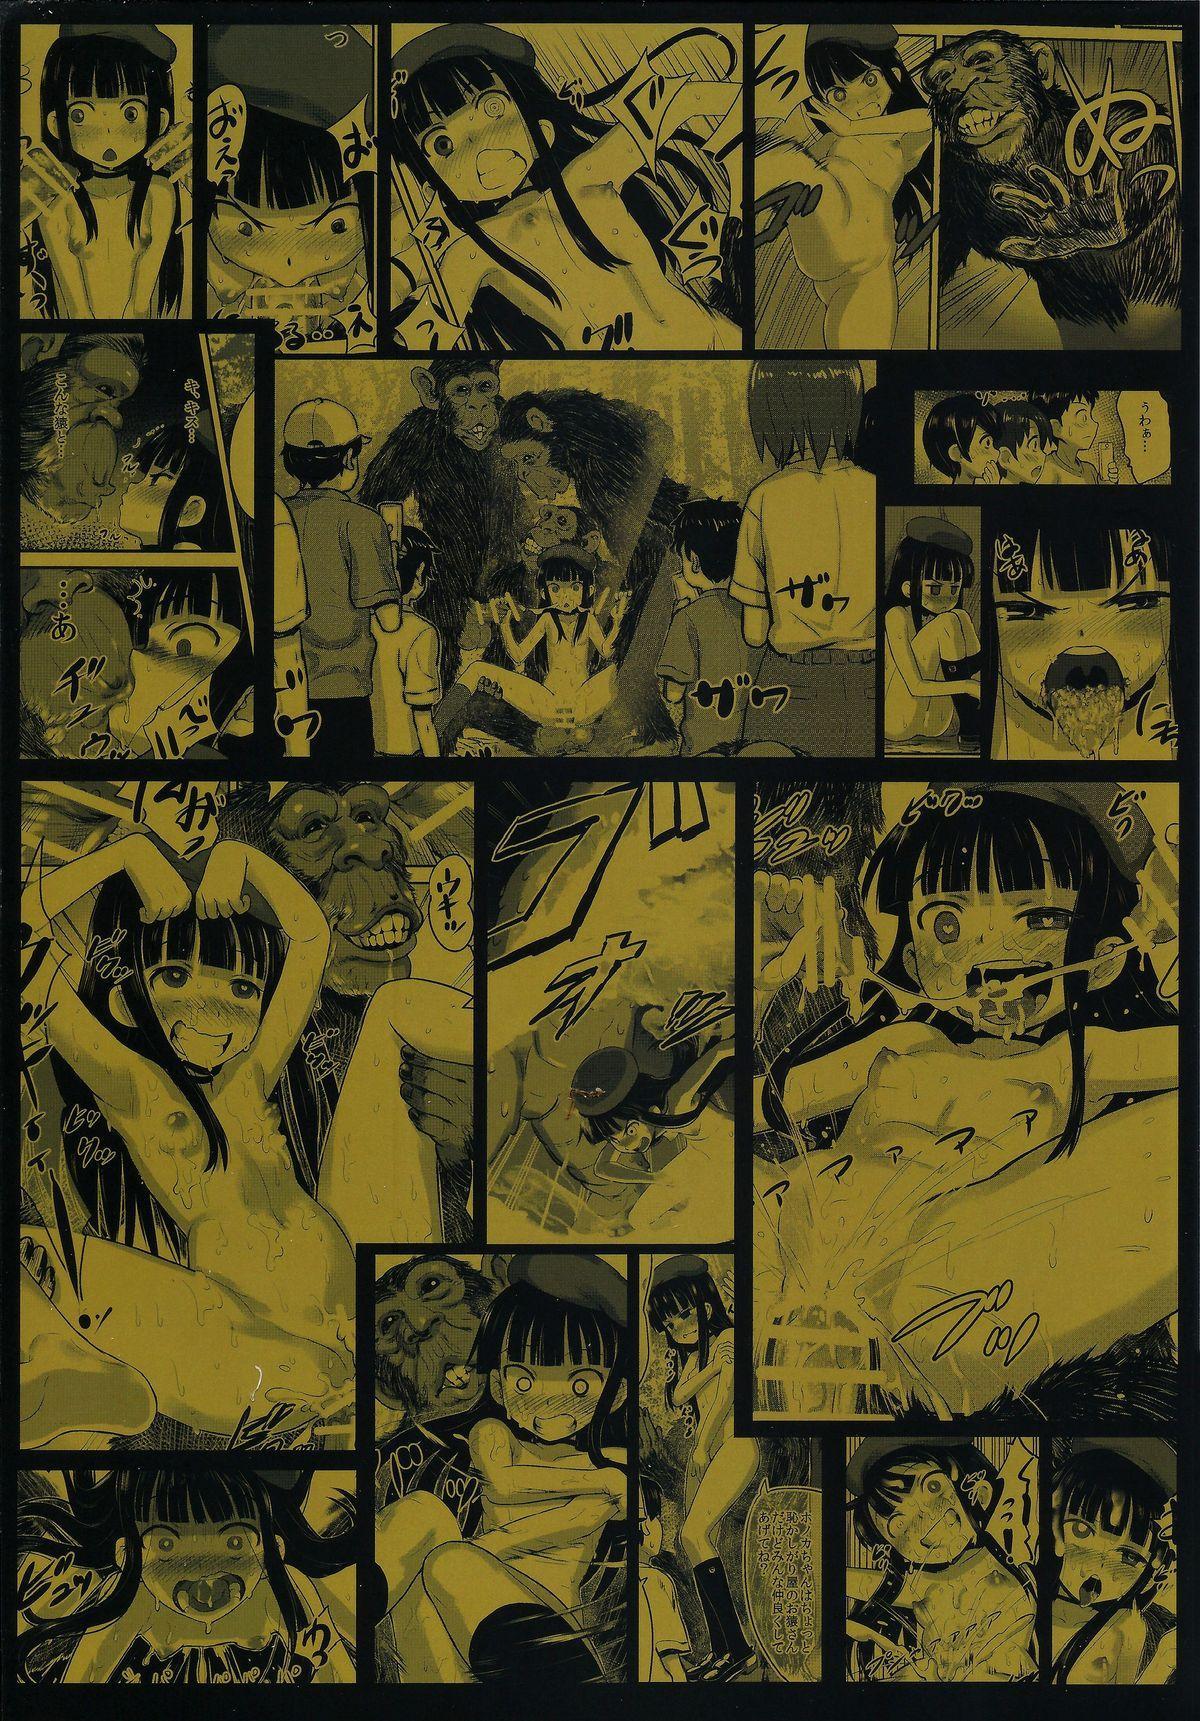 Hadakahime Honoka 2 Misemono Tanetsuke Saru Koubi | Naked Princess Honoka 2 - Mating Exhibition: Monkey Coitus 1